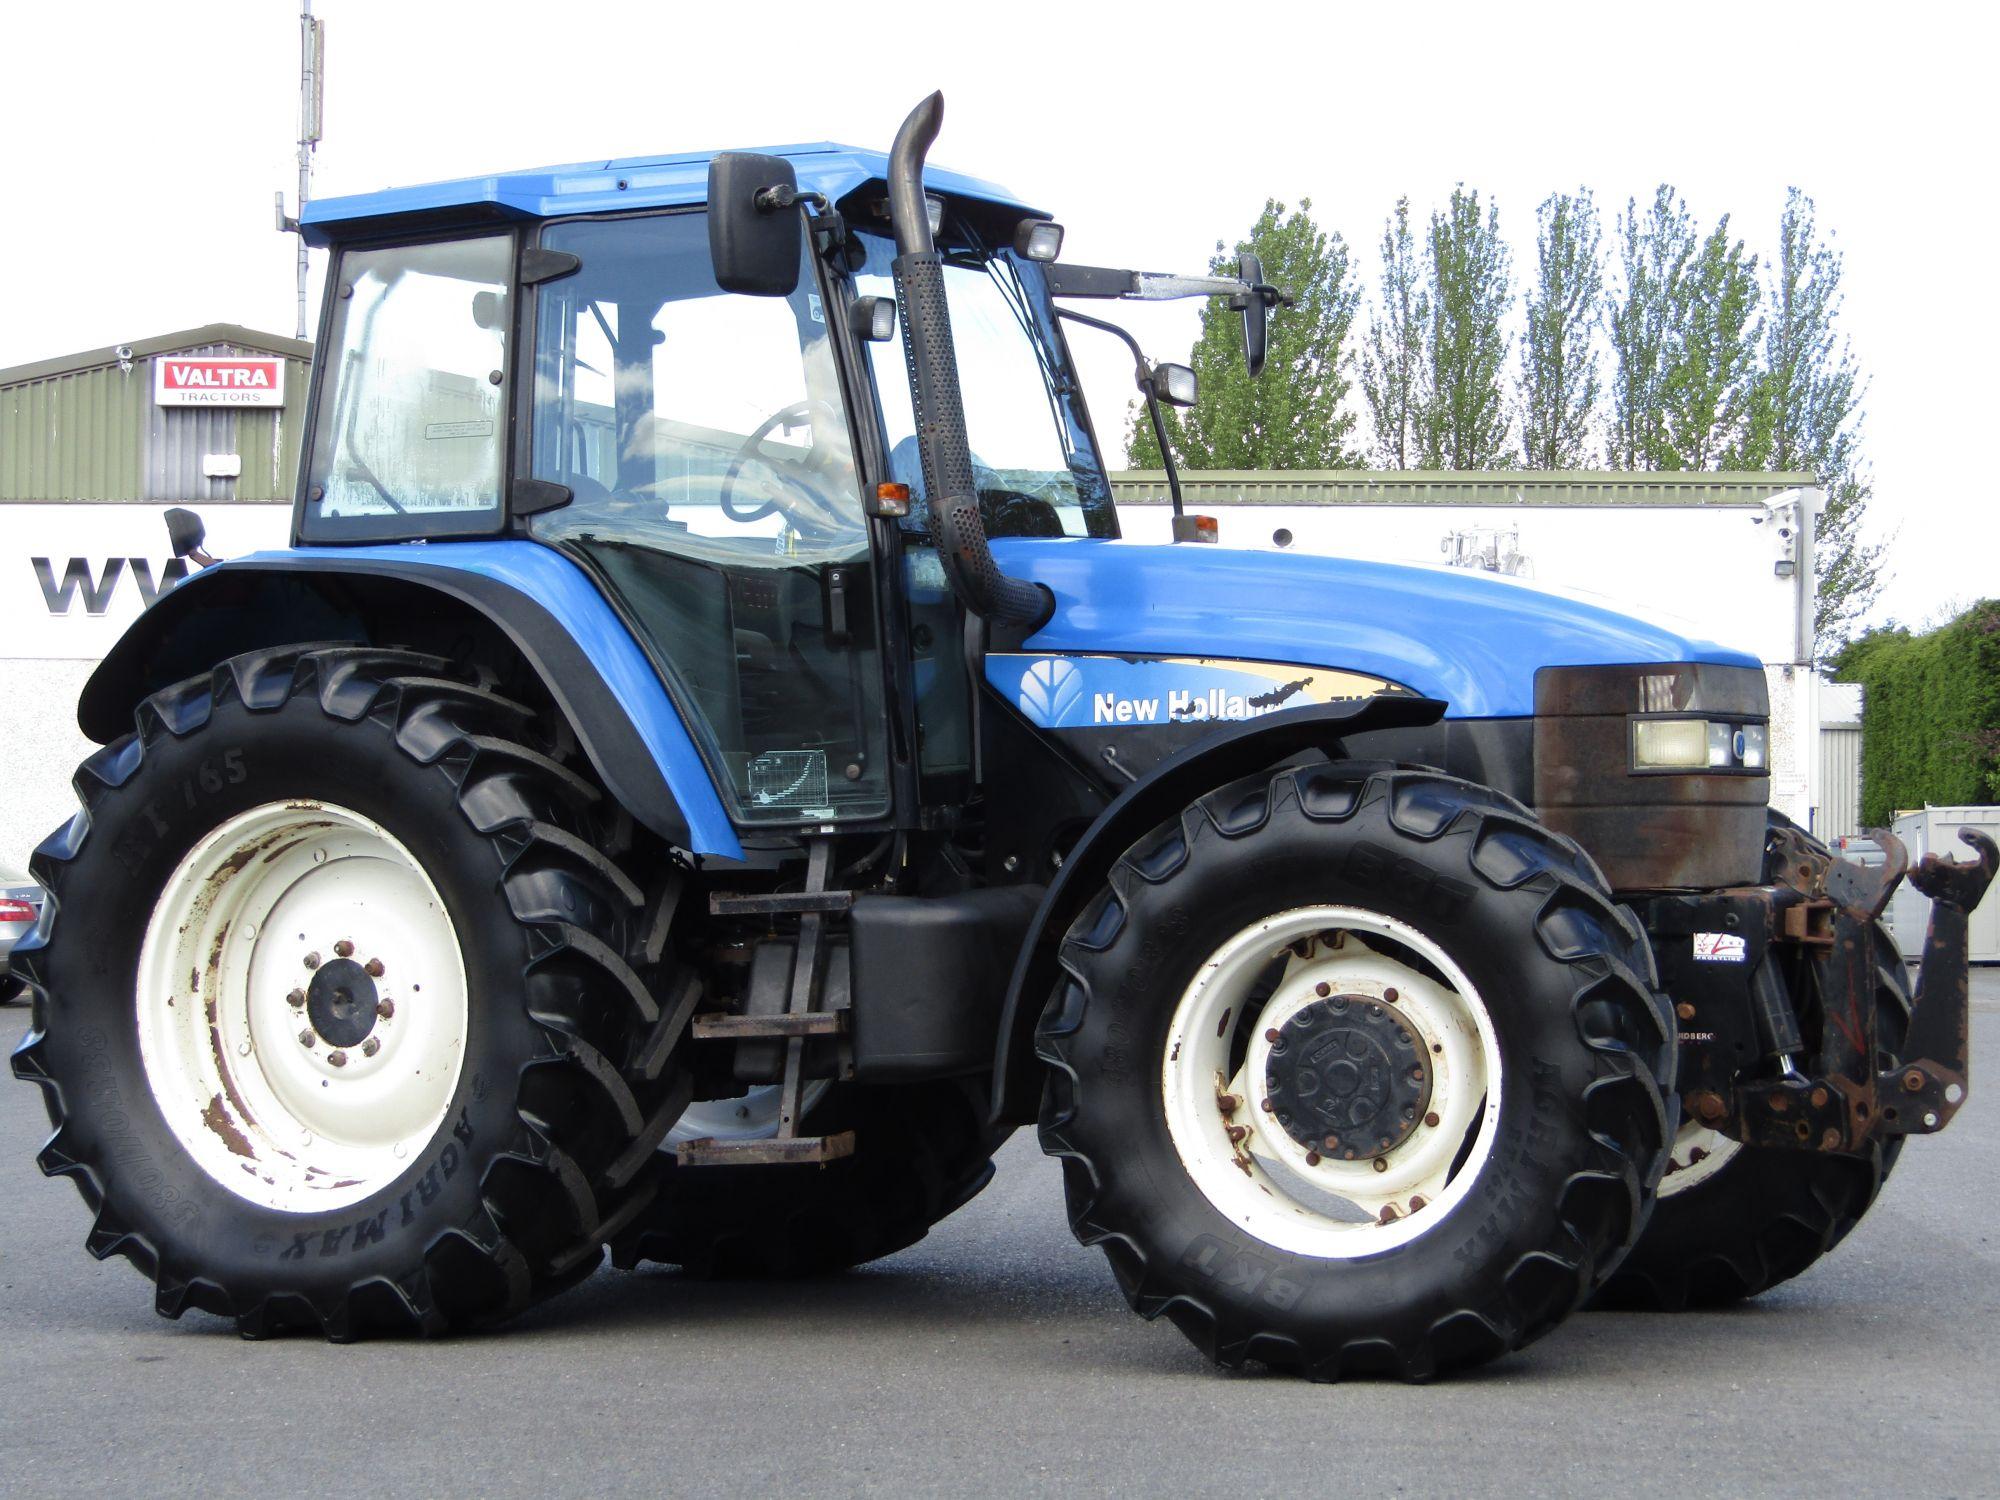 New Holland TM150 c/w Front Linkage | Clarke Machinery